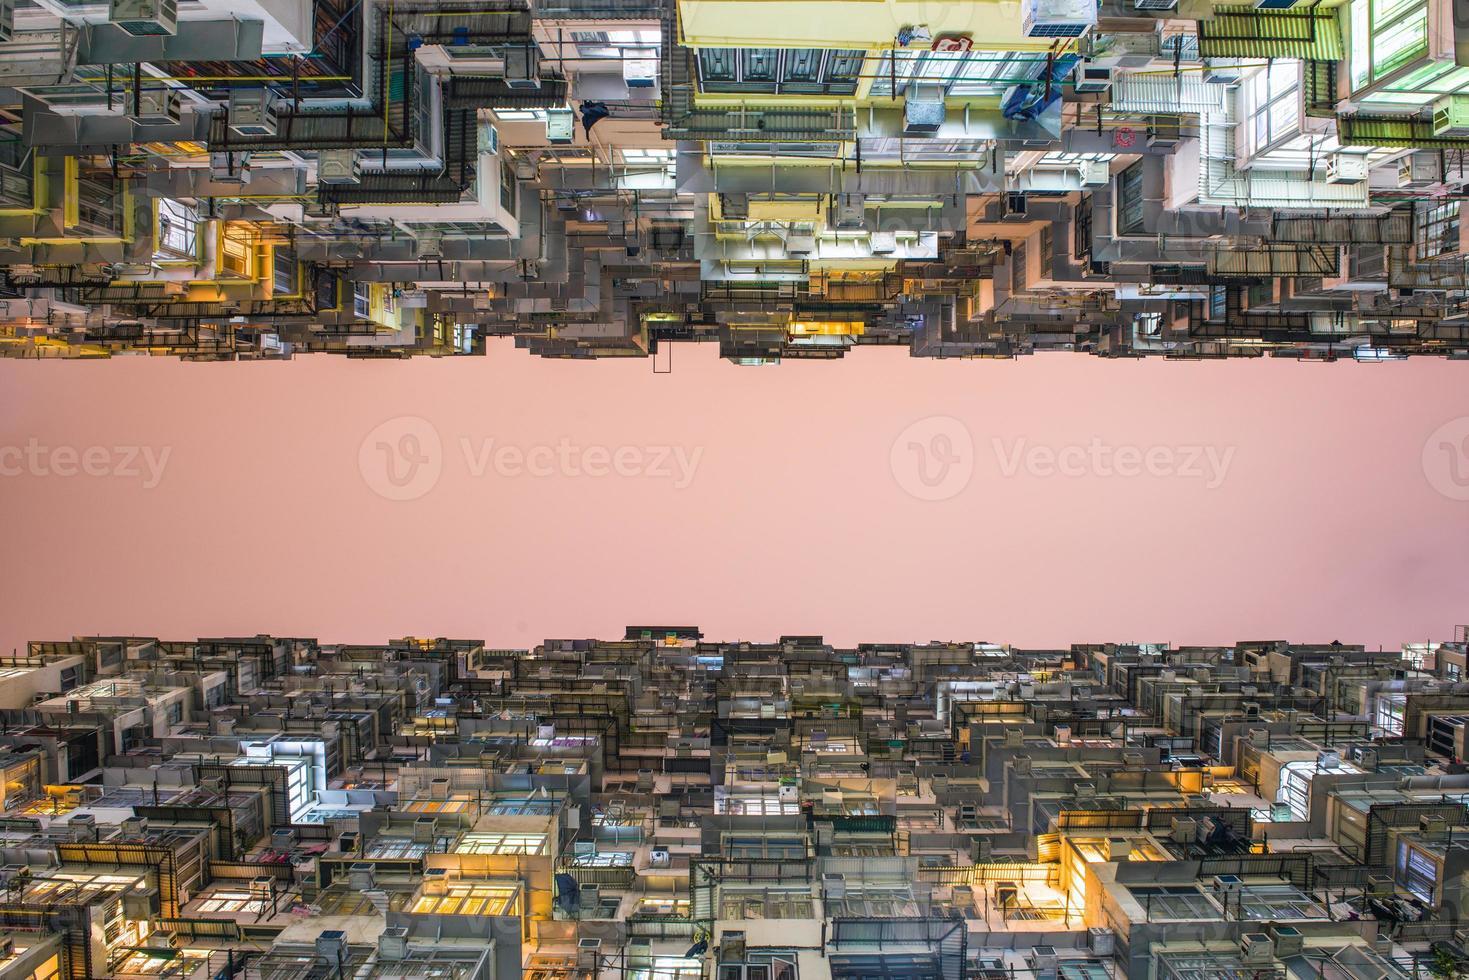 manoir montagnard, quarry bay hong kong photo